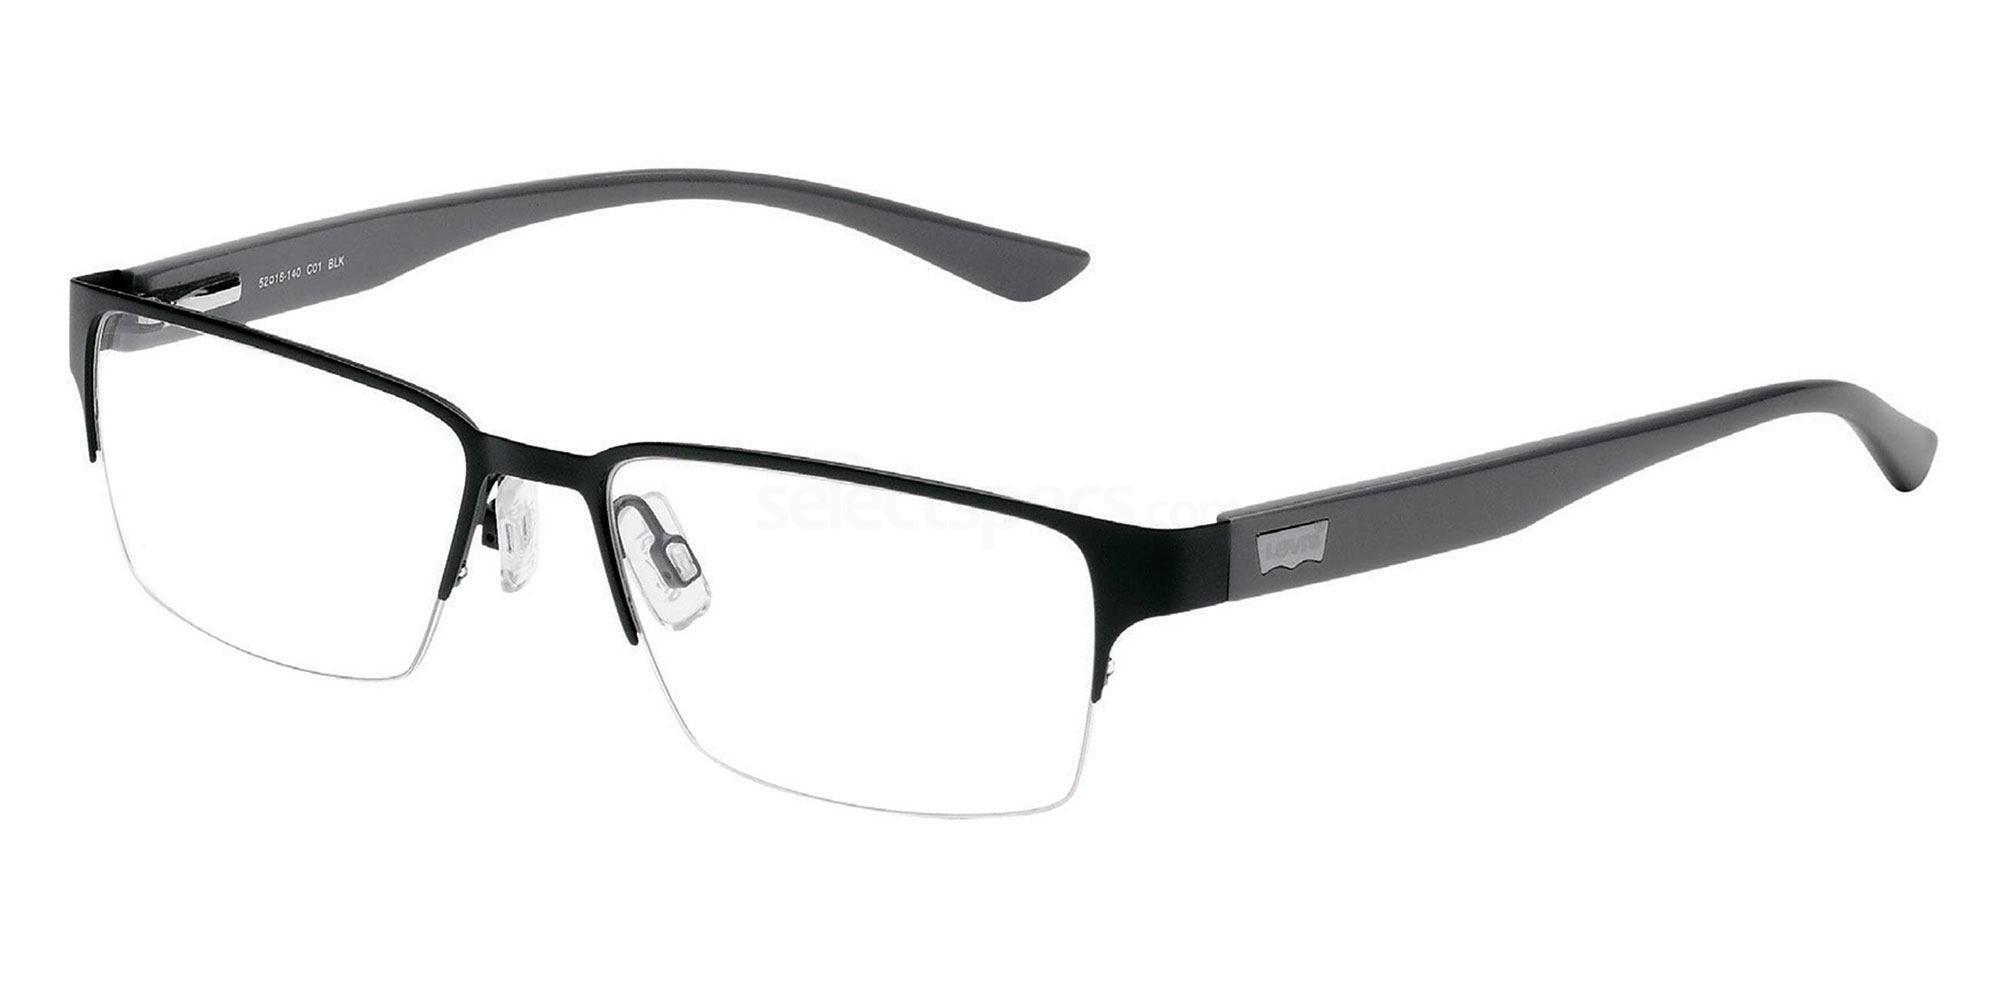 01 BLK LS106 Glasses, Levi's Eyewear